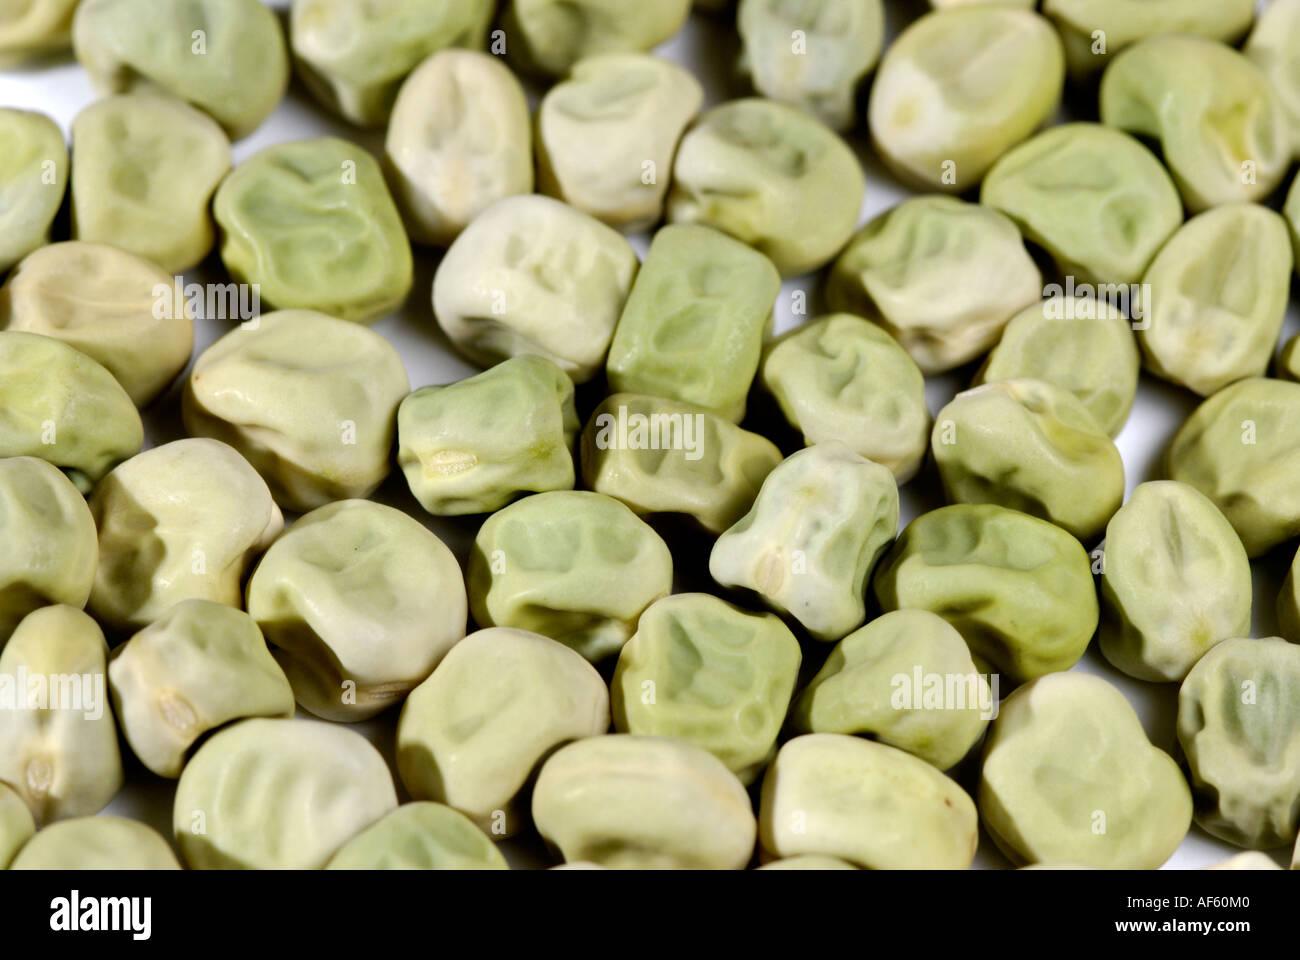 Green Wrinkled Pea Seeds Traits Gregor Mendel Stu D In